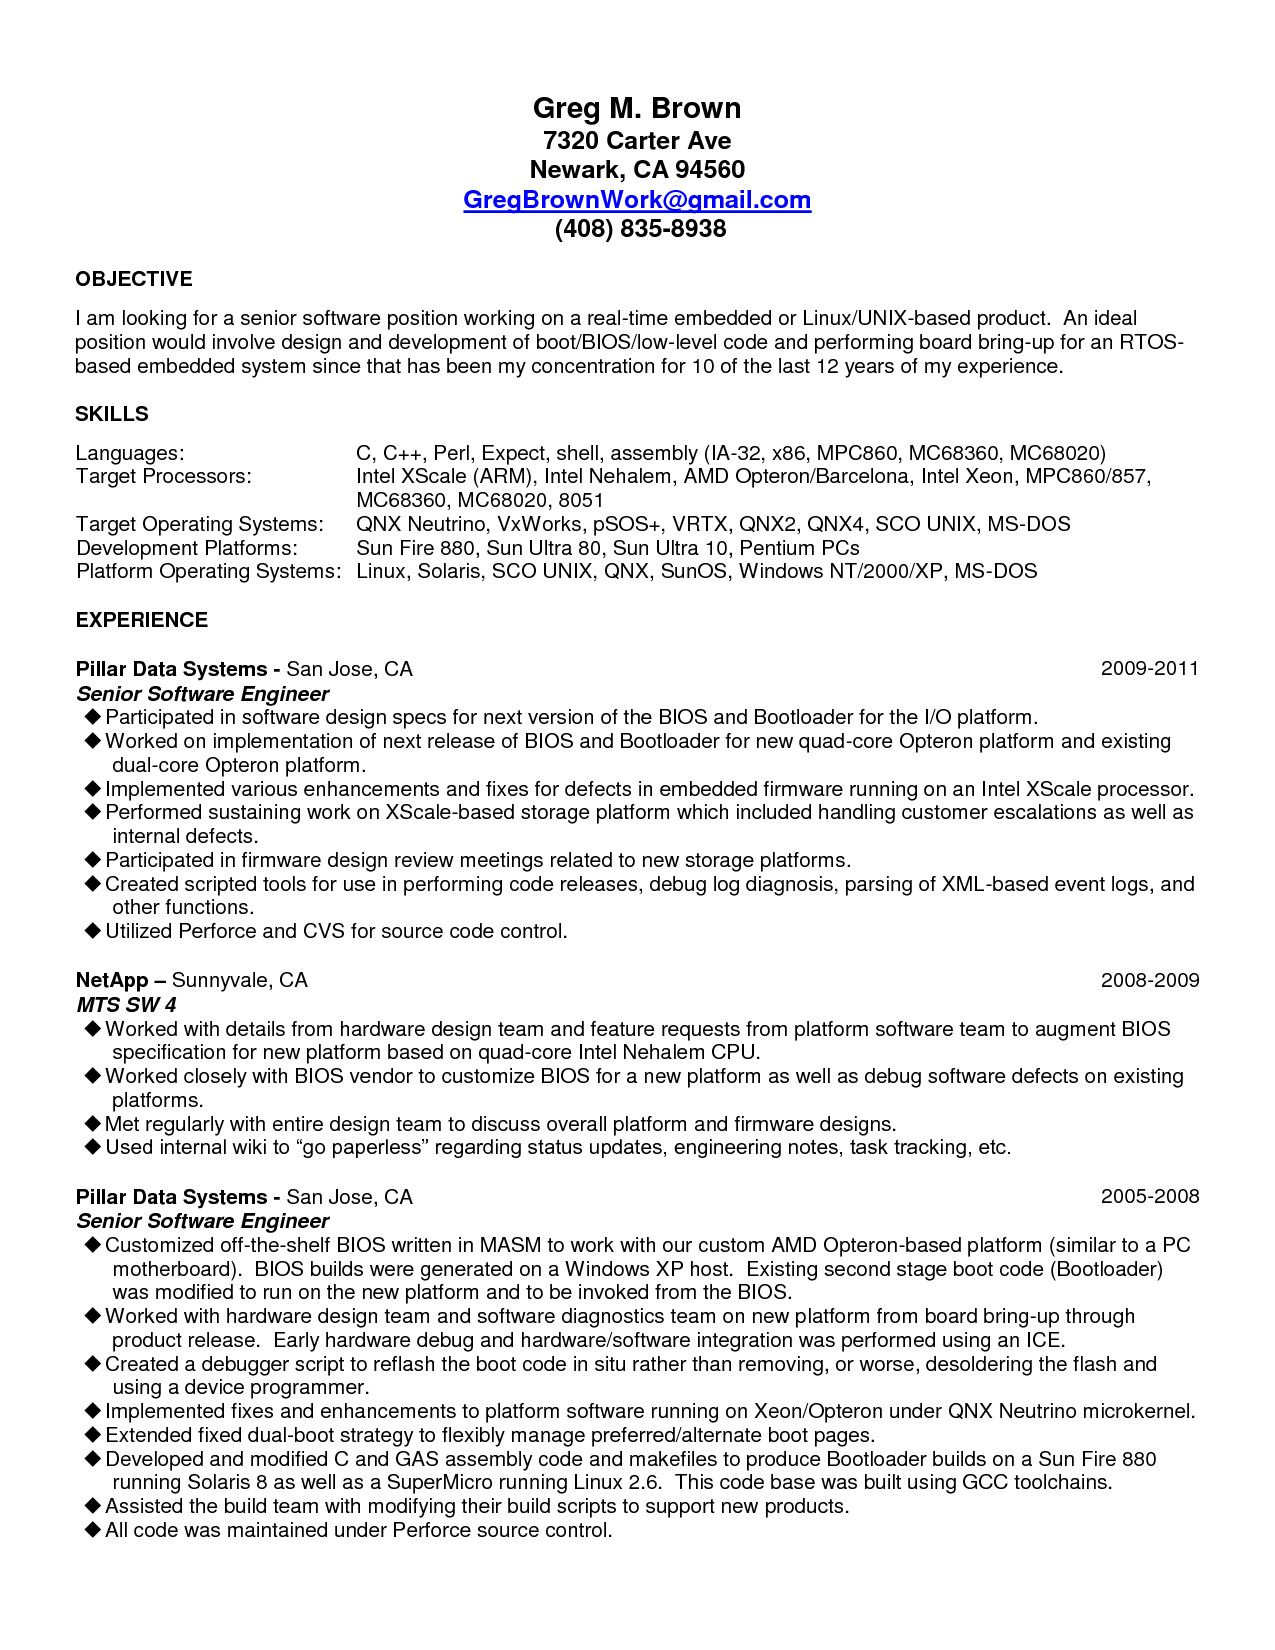 Sample Senior Software Engineer Resume Teacher Resume Template Free Teacher Resume Template Resume Template